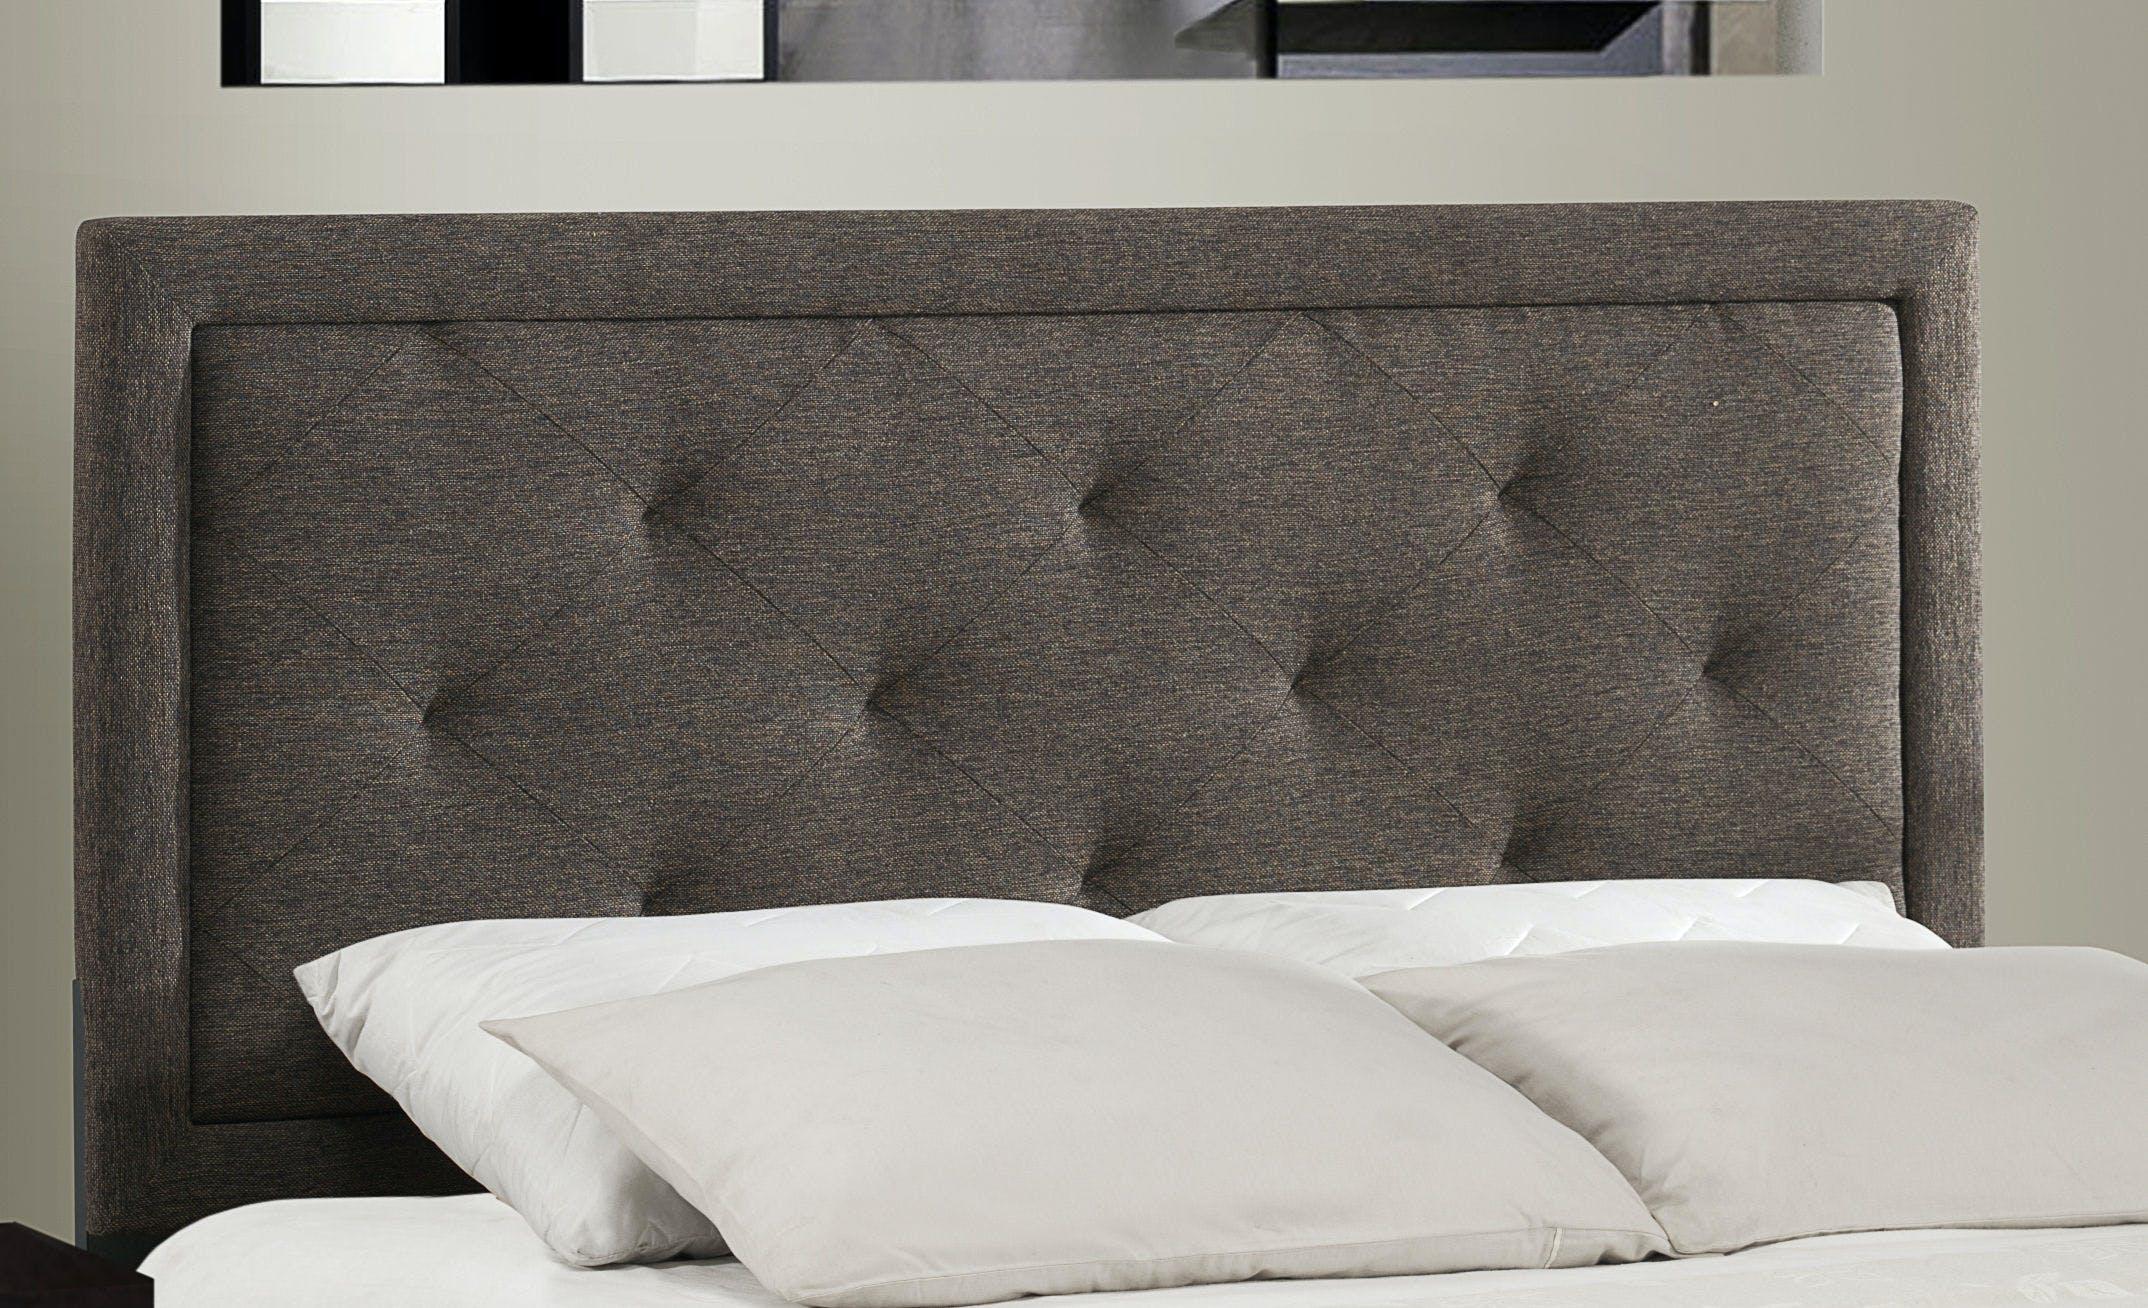 Hillsdale Furniture Bedroom Becker Headboard King Headboard Frame Included Black Brown Fabric